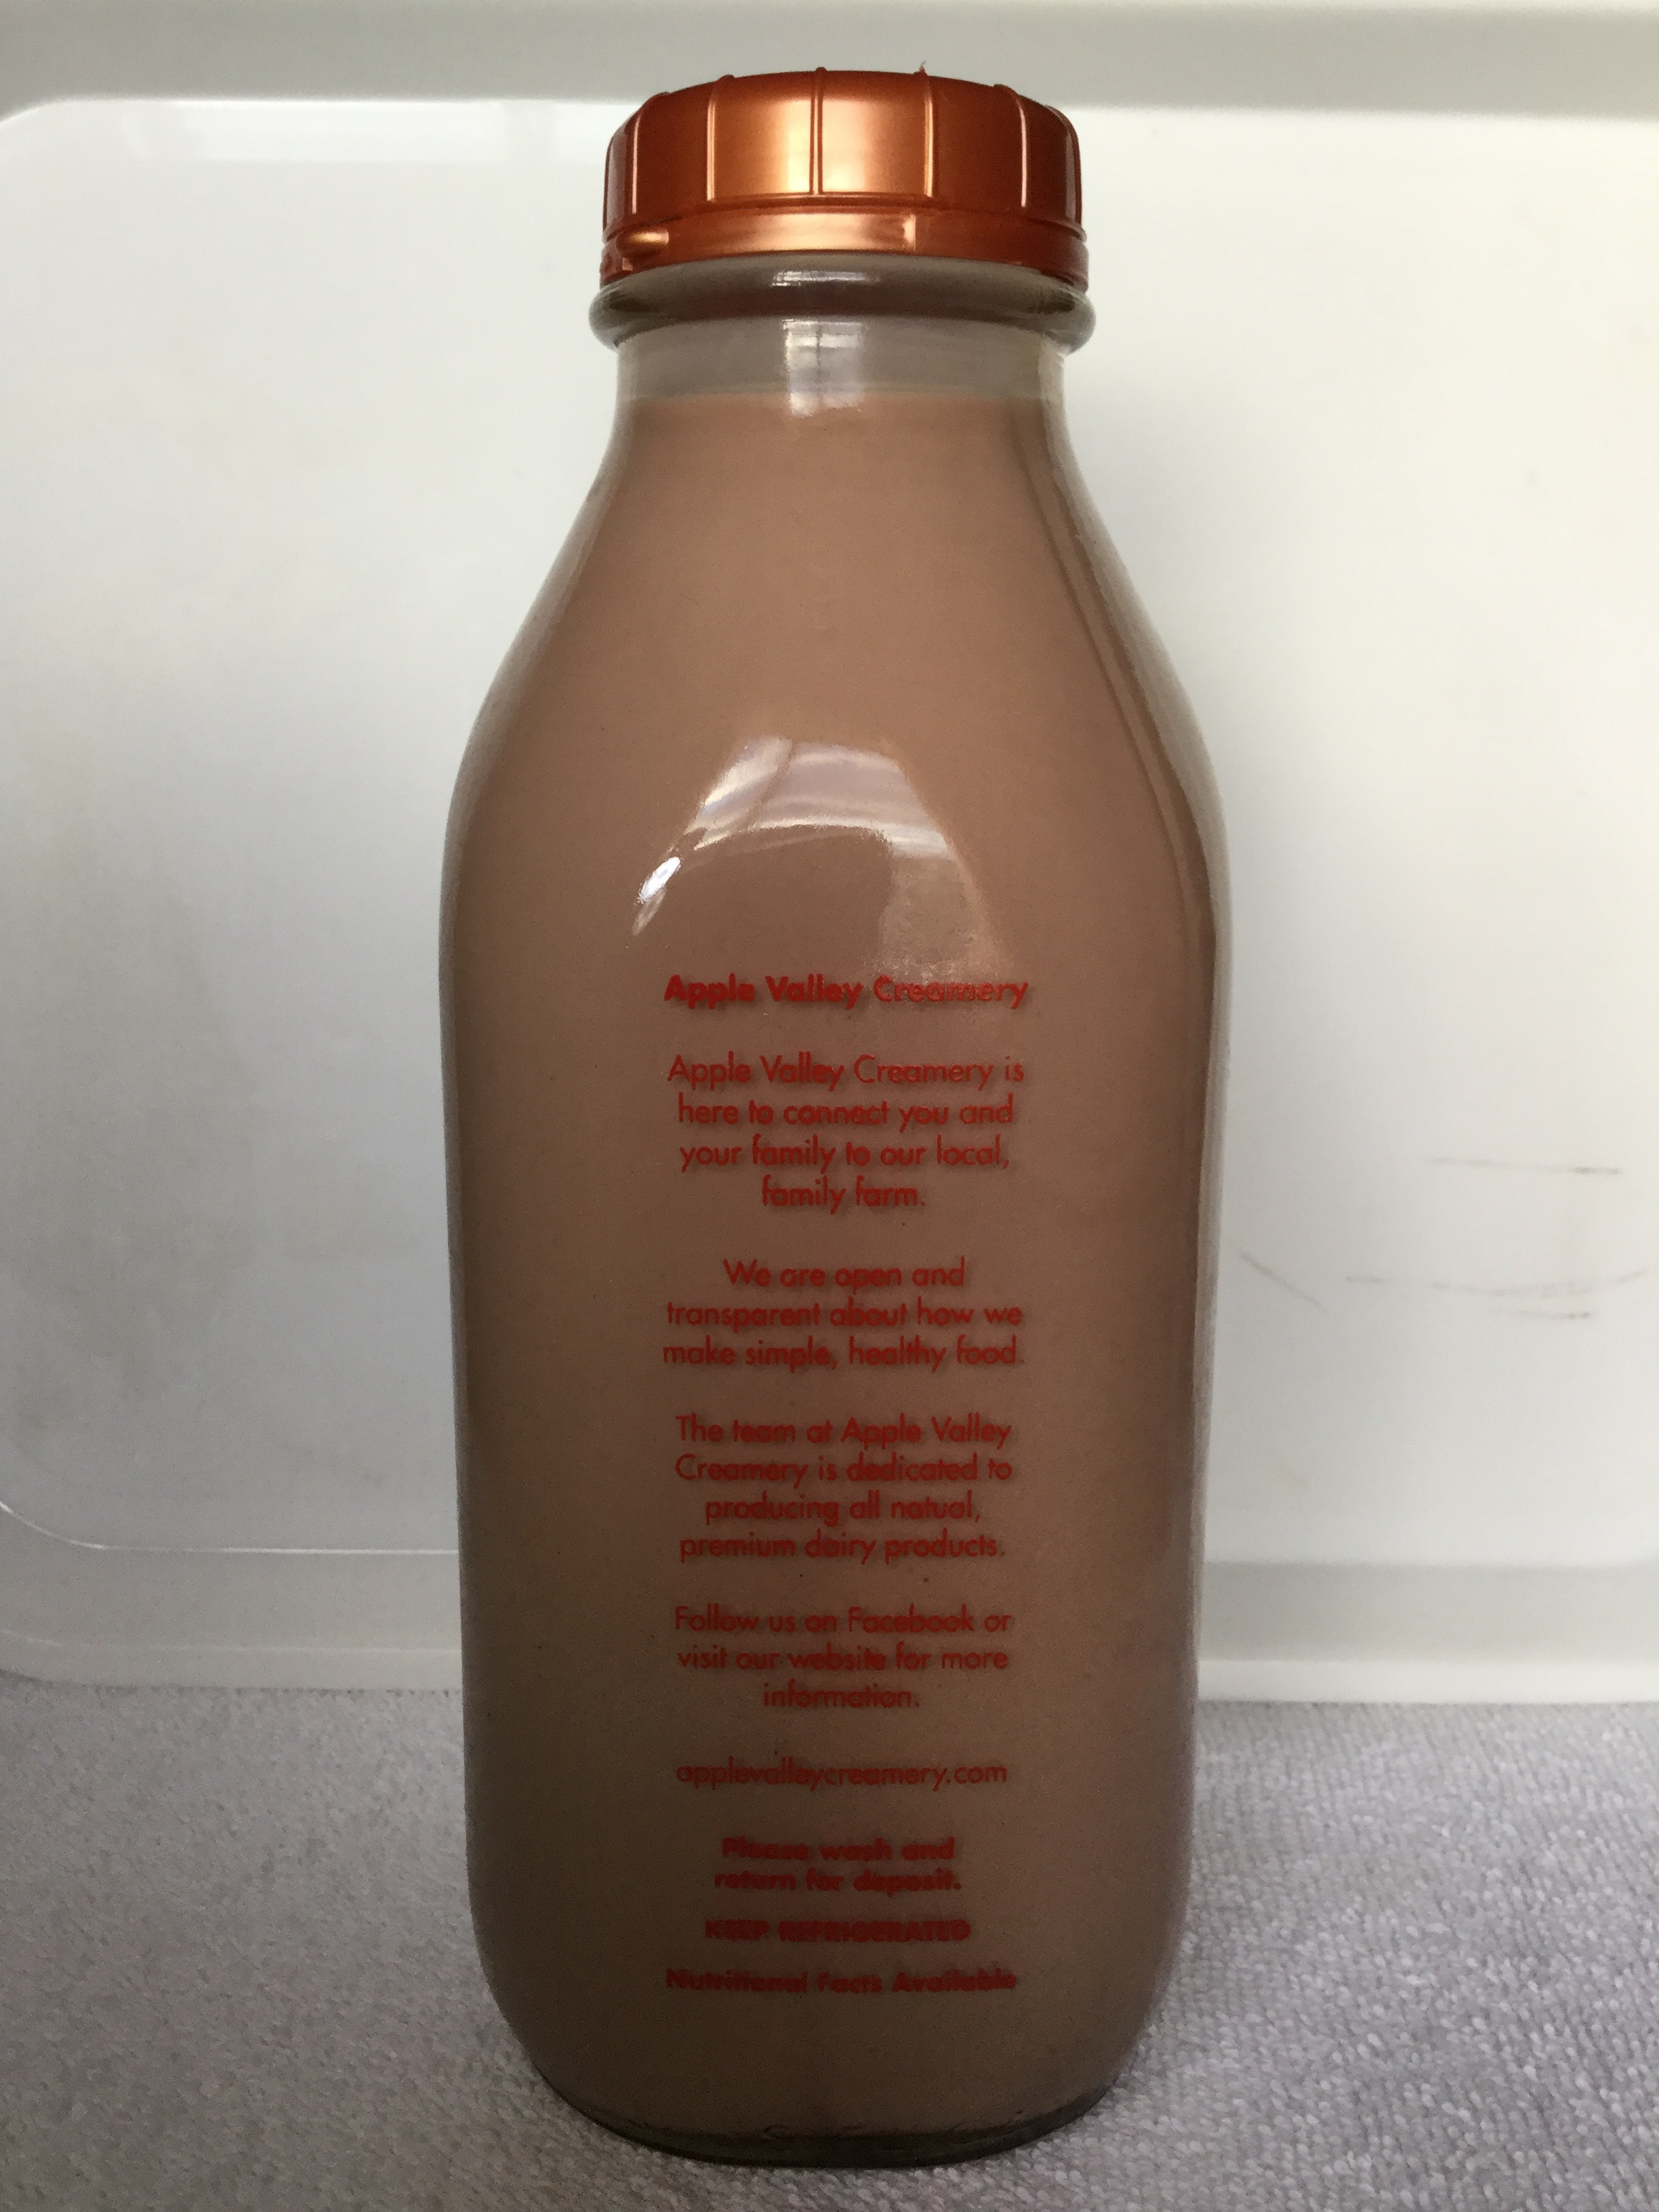 Apple Valley Creamery Chocolate Milk Side 1